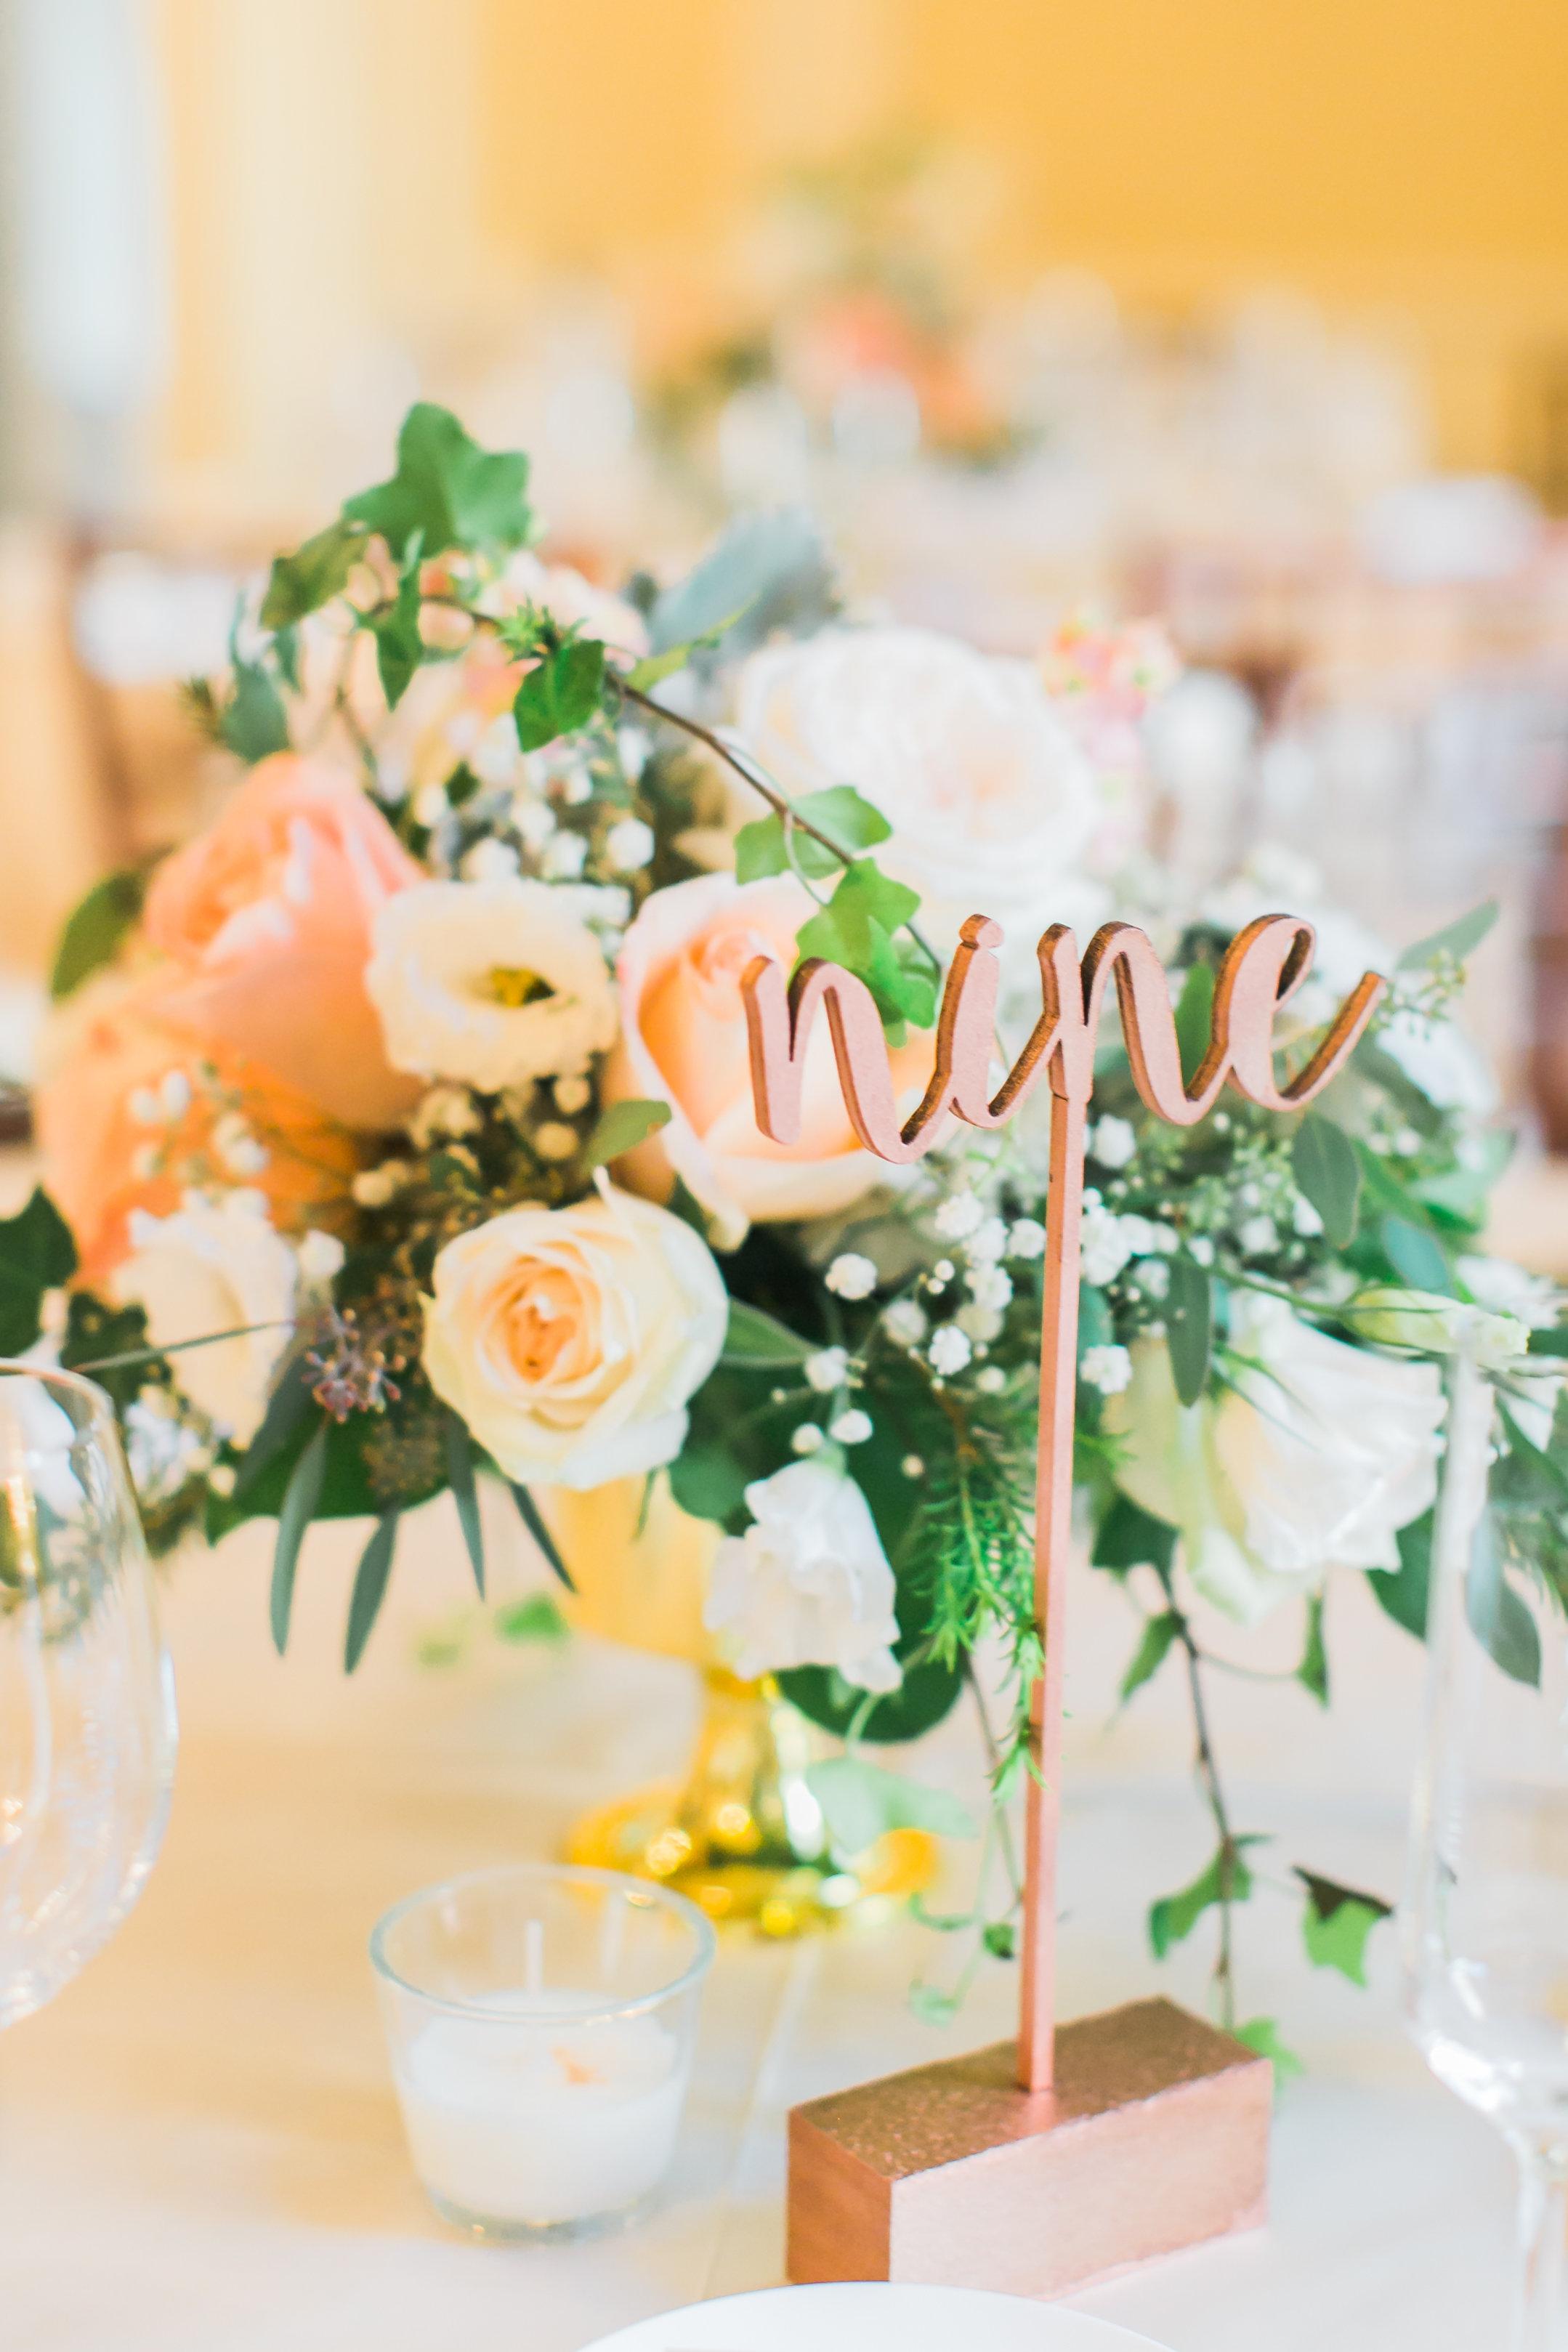 Phoebe Lo Events Toronto Wedding - Graydon Hall Manor Garden Charm Event 026.jpg